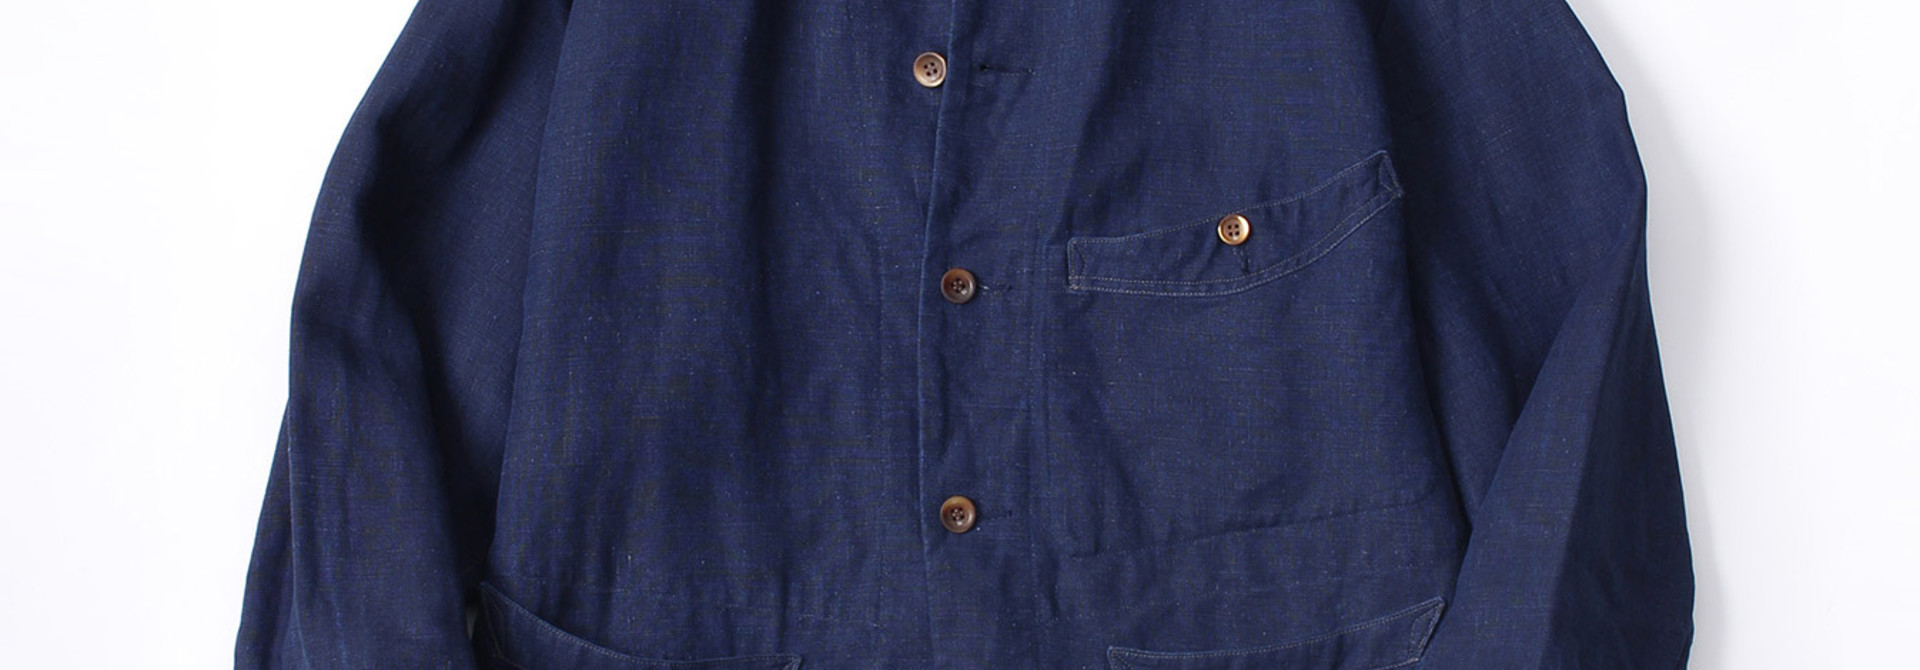 WH Indigo Linen Stand Collar Jacket